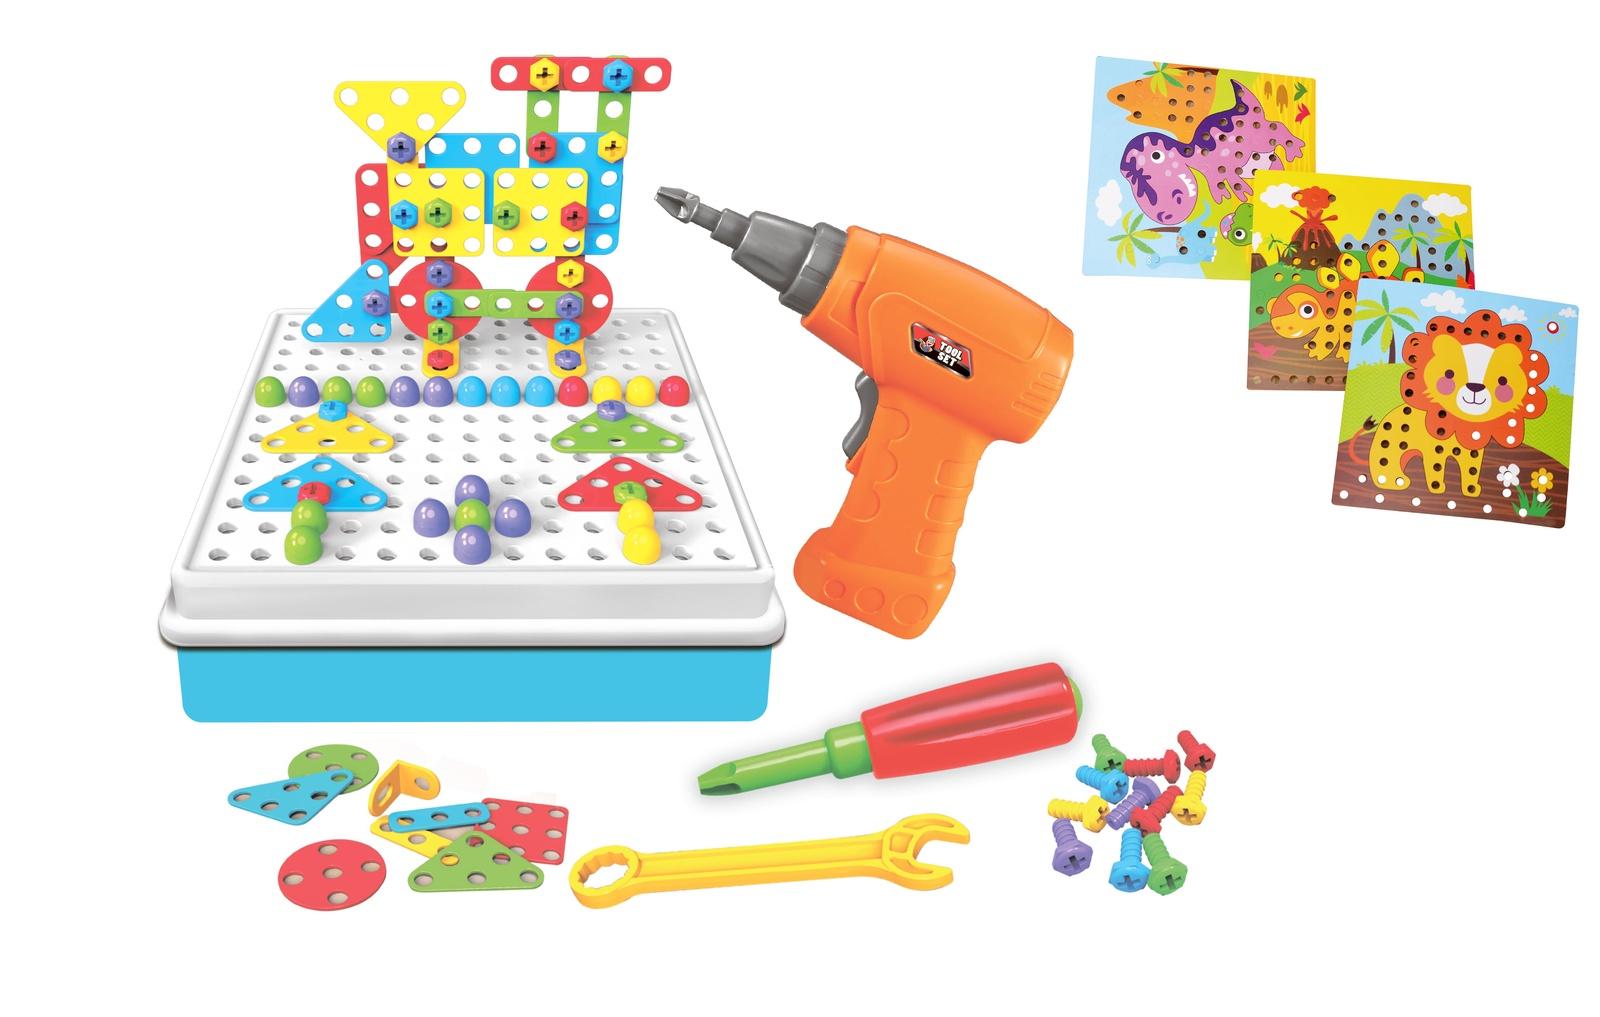 Детский развивающий конструктор Create and Play в Стаханове